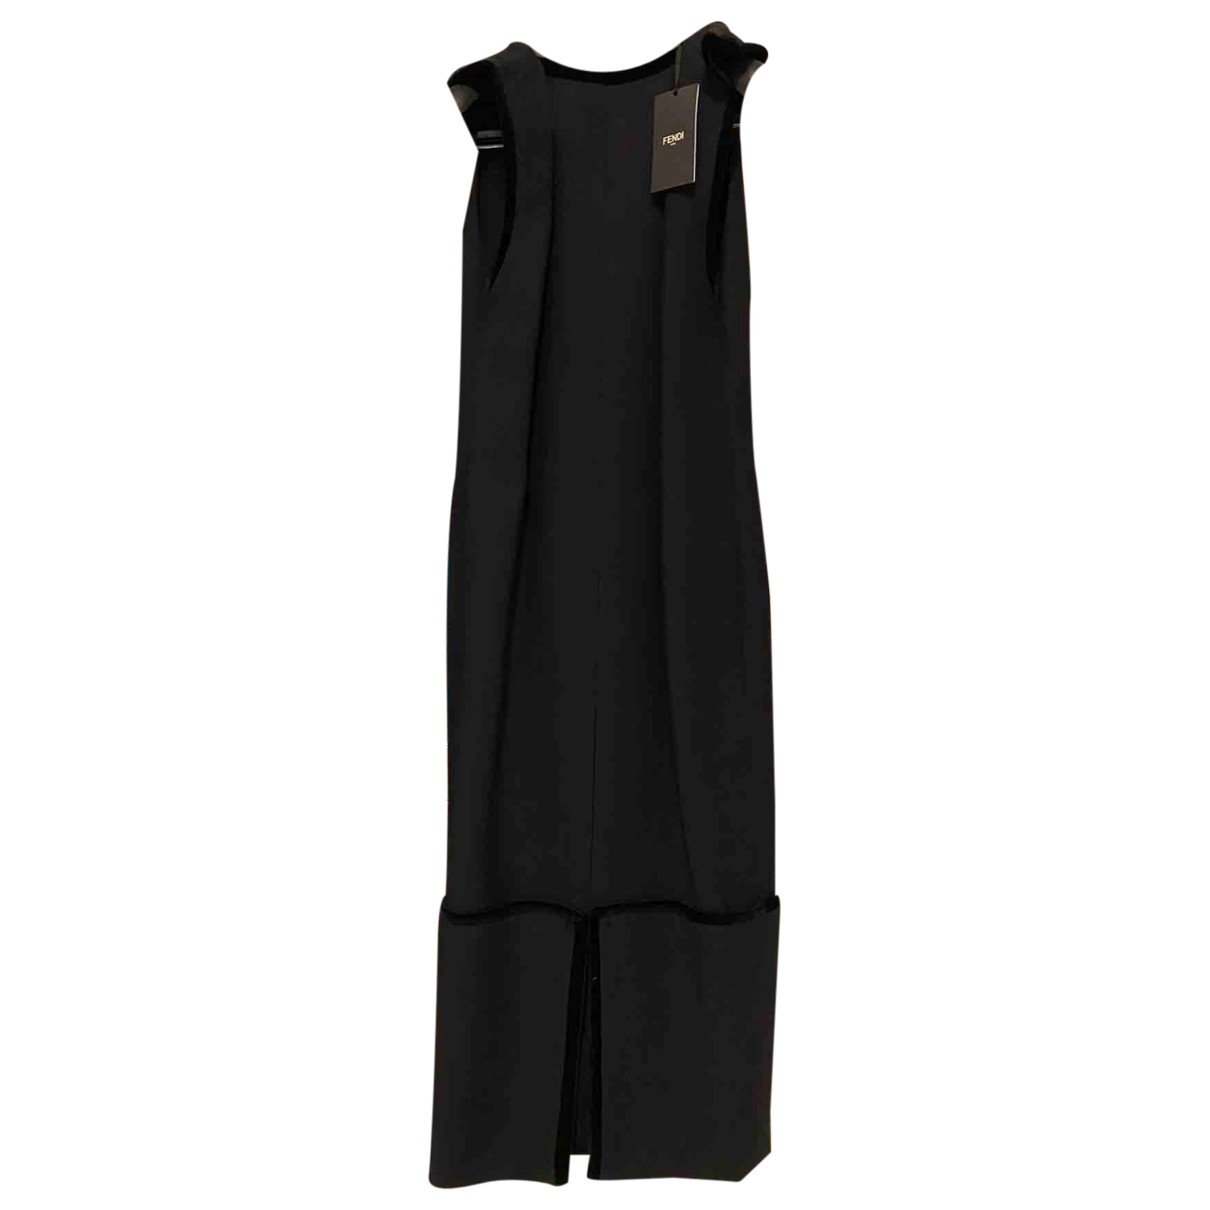 Fendi \N Kleid in  Schwarz Wolle